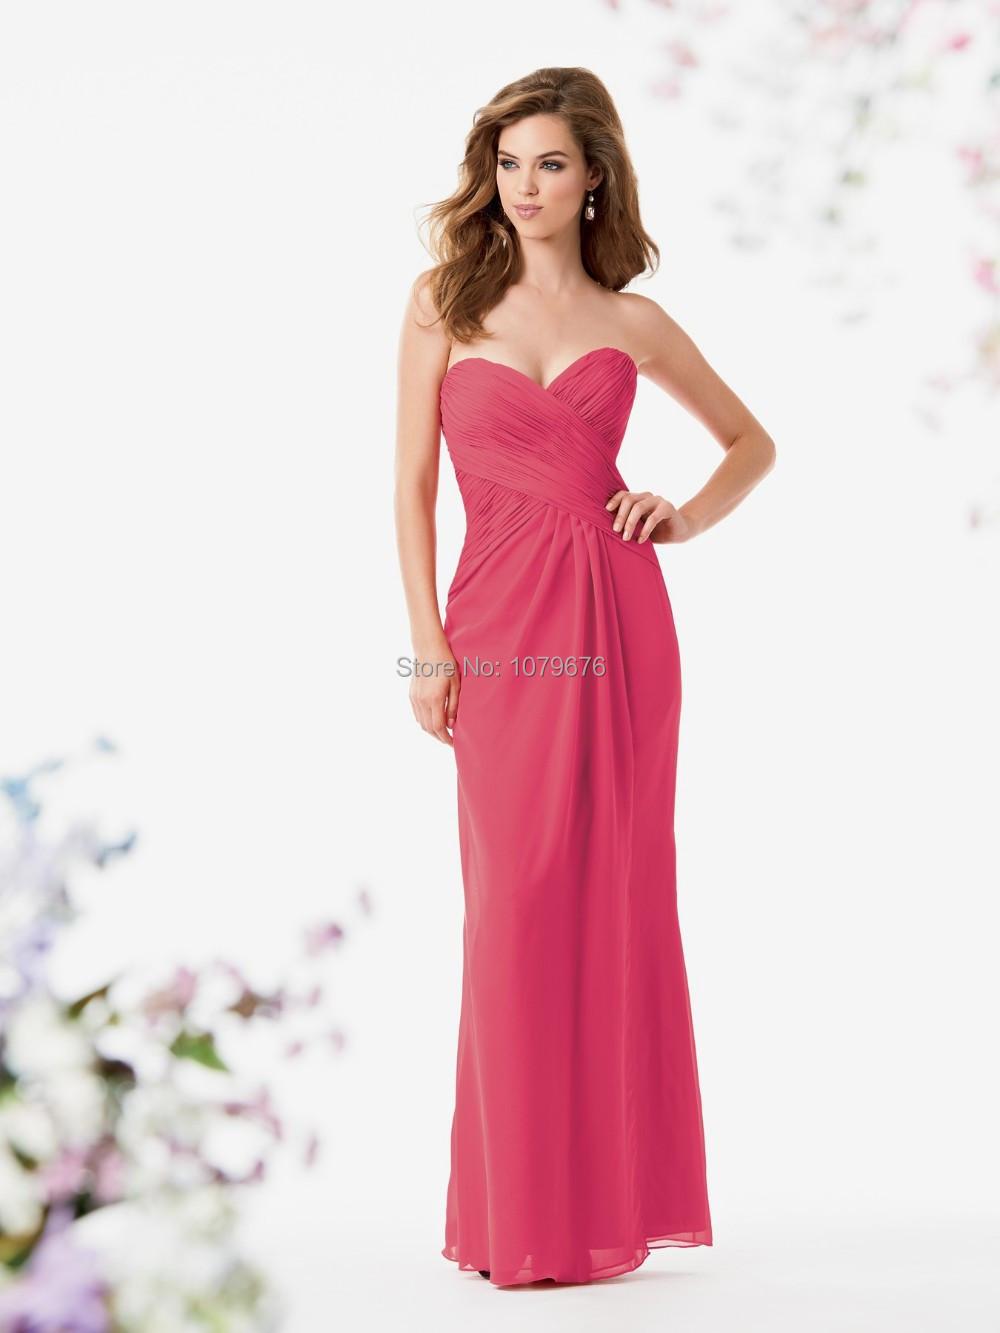 Cheap Wedding Dress With Hot Pink, find Wedding Dress With Hot Pink ...